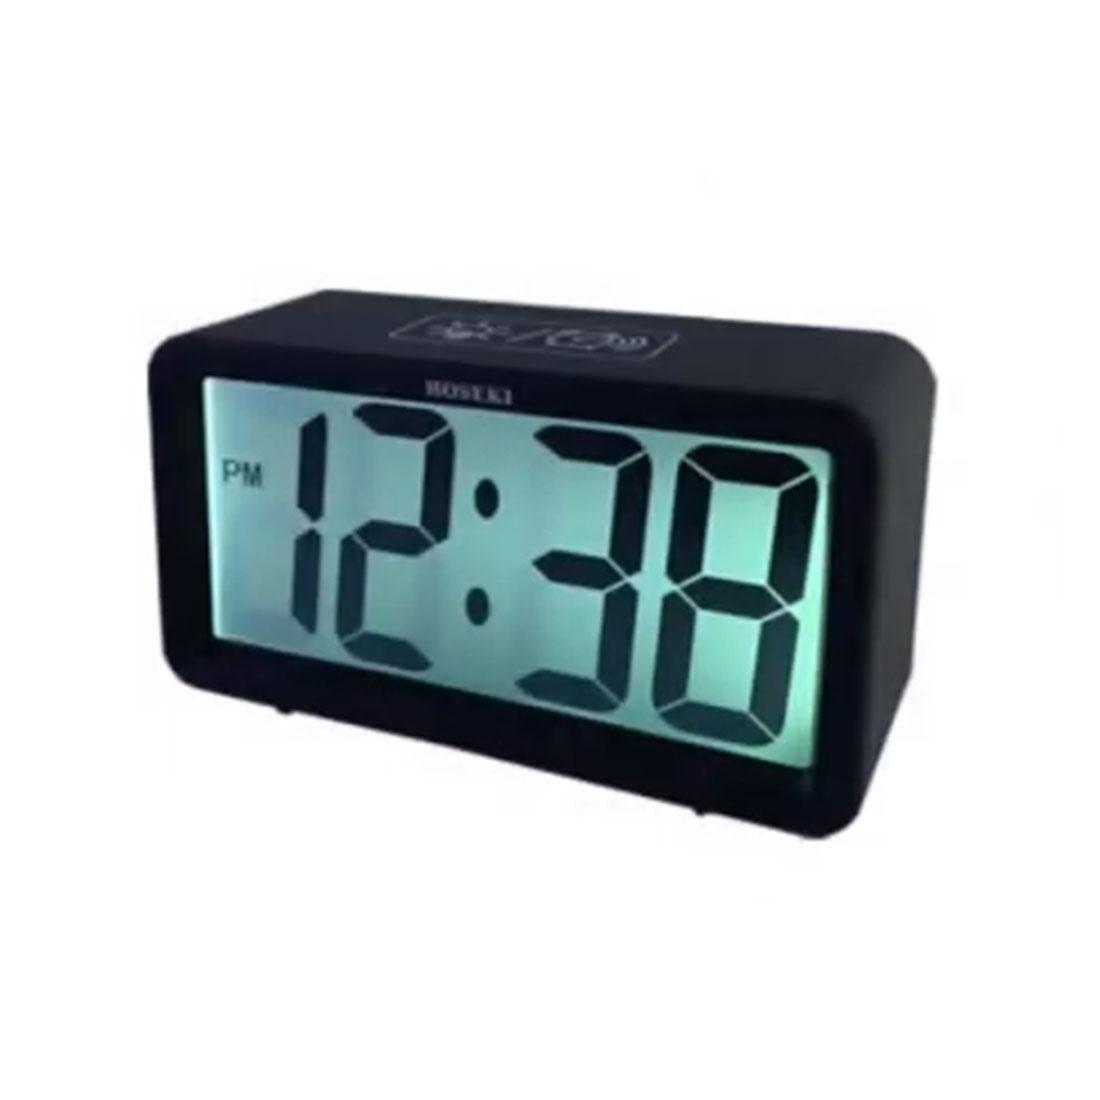 Hoseki H-2300BK H-2300 Black Rectangle LCD Digital Desk Alarm Clock